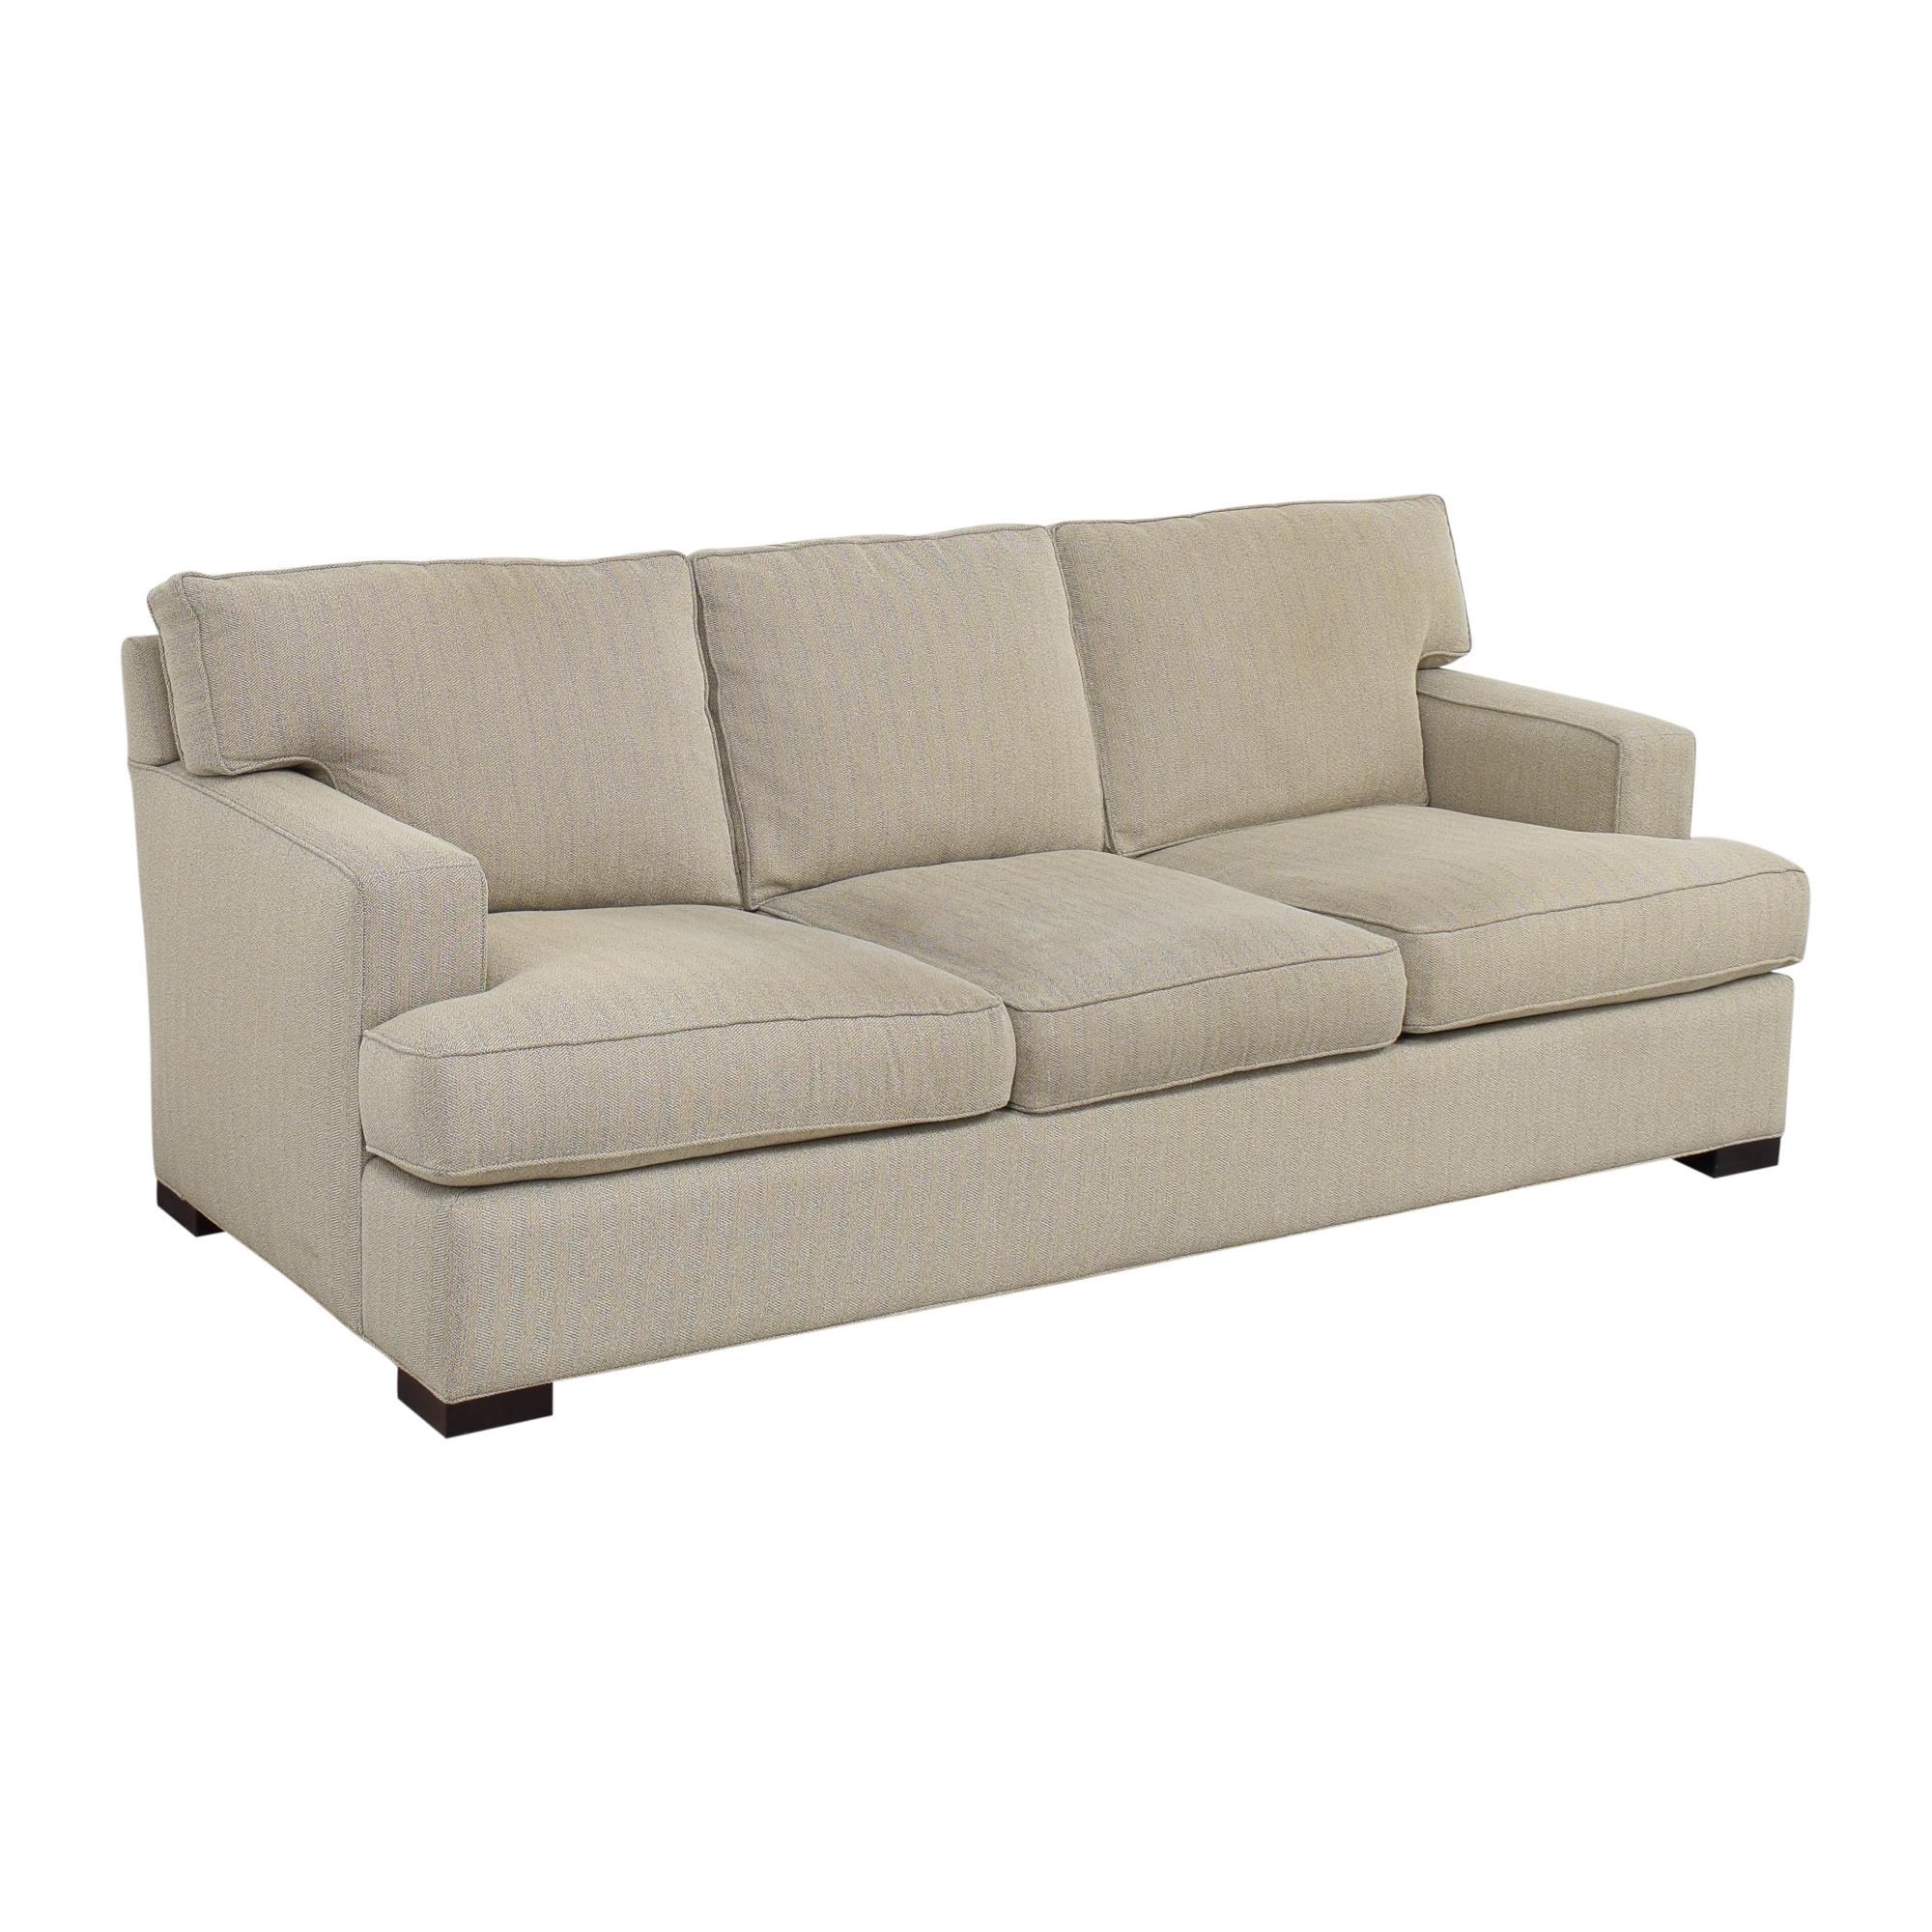 shop Arhaus Dune Three Cushion Sofa Arhaus Sofas